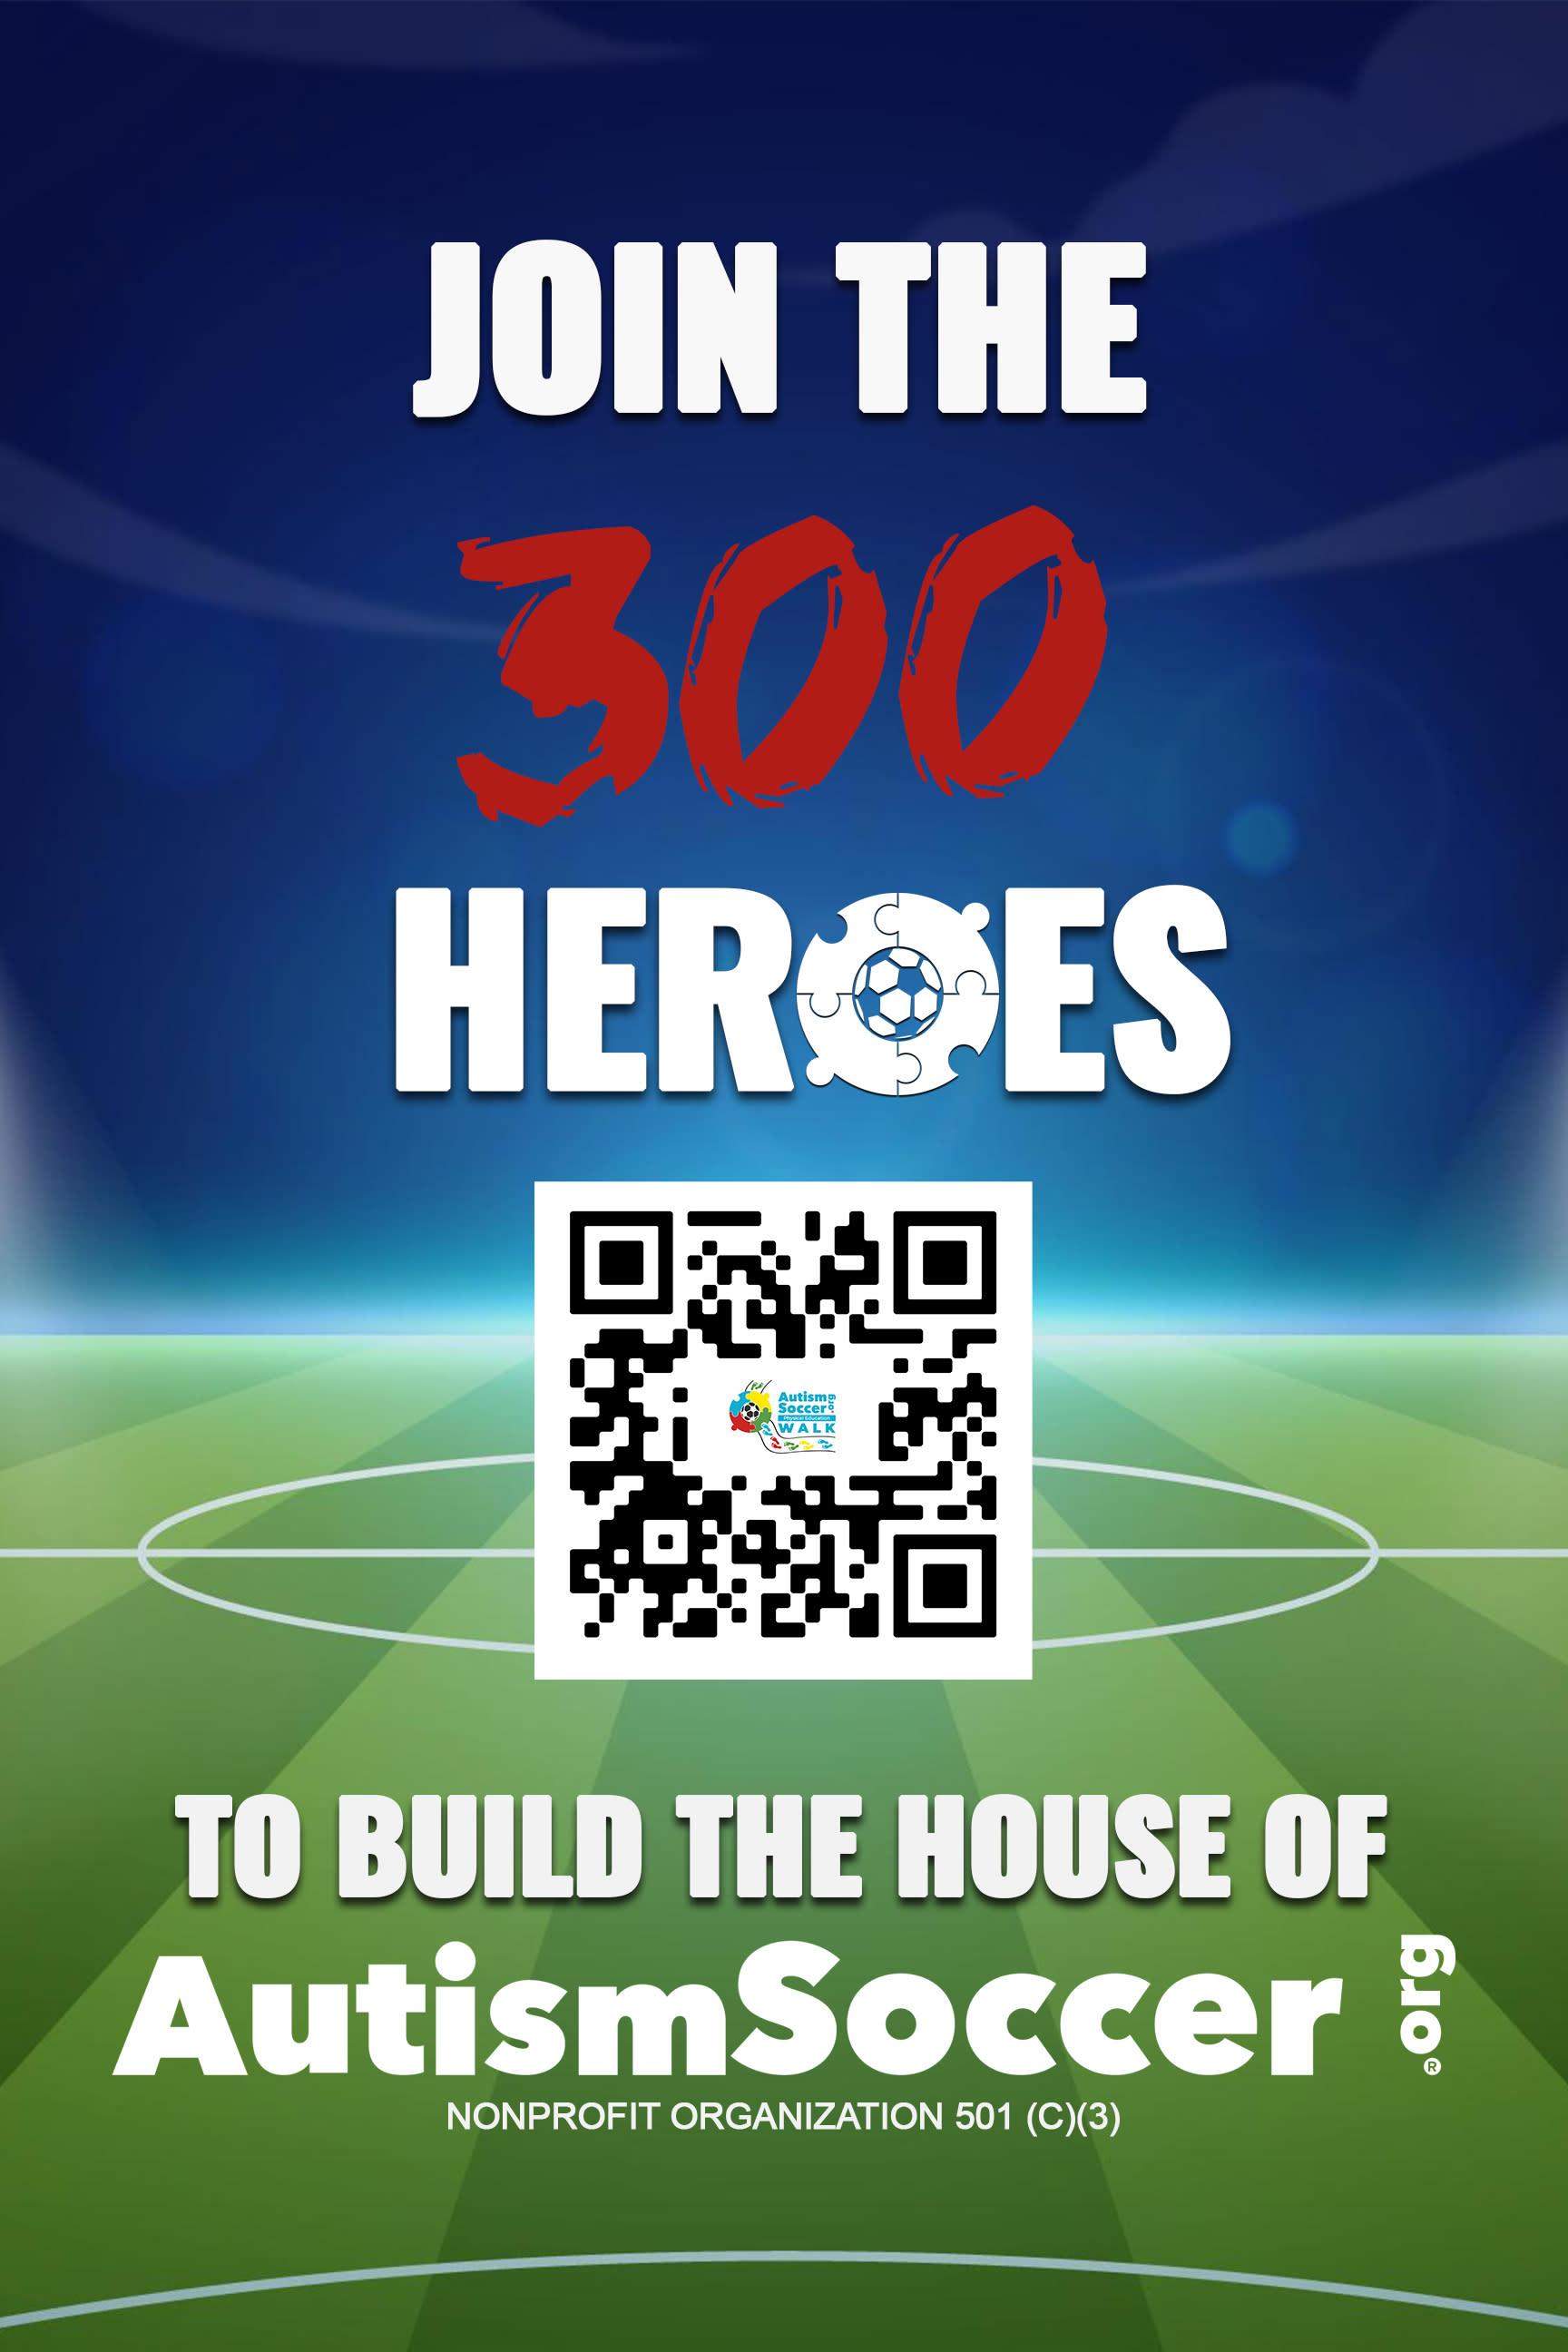 Autism Soccer Flyer.jpg